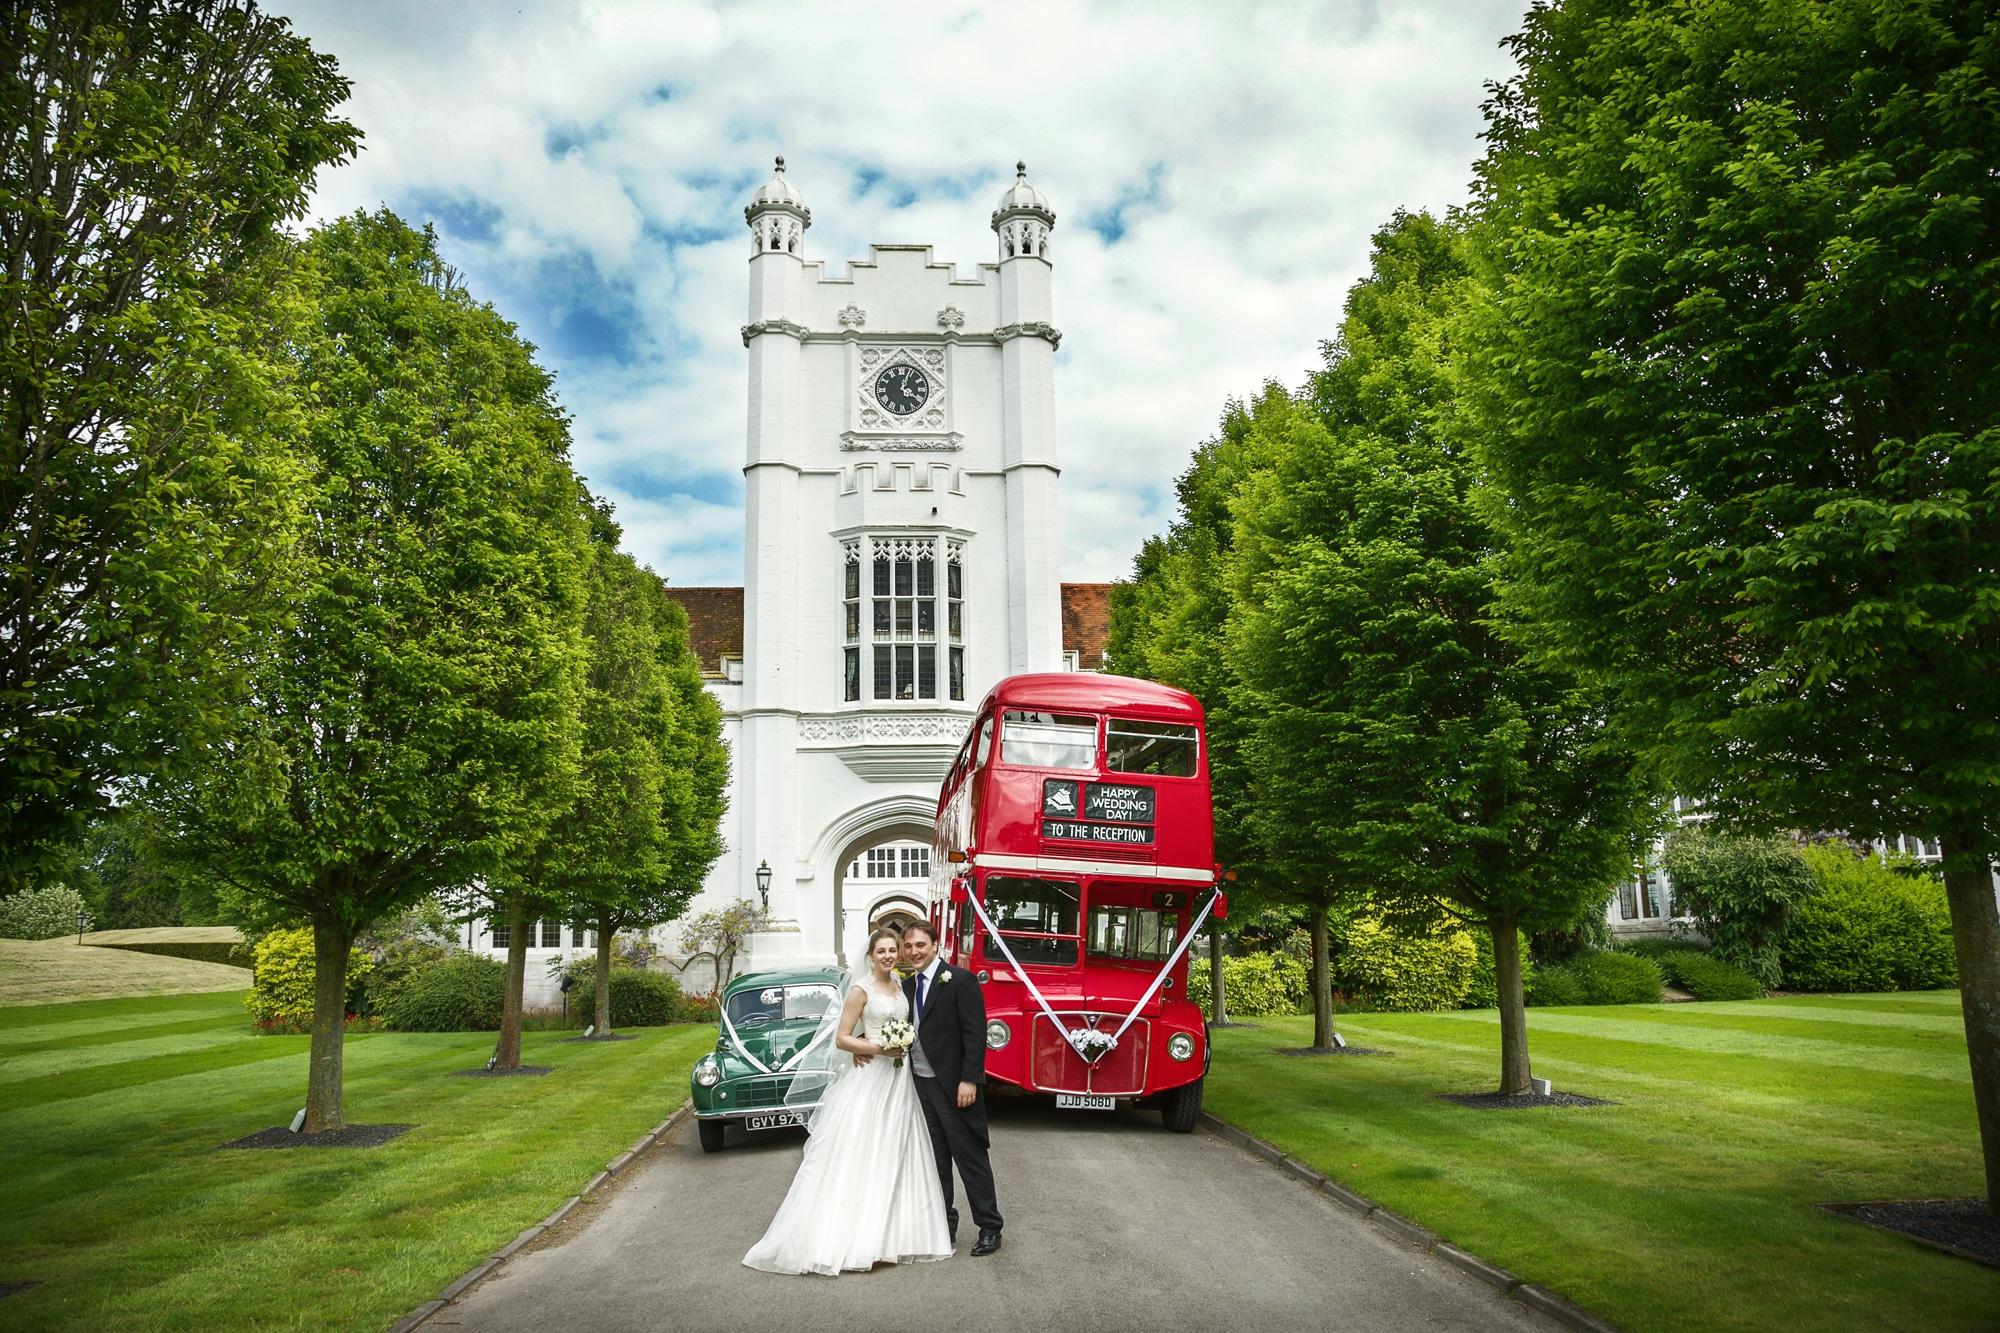 Adam_Hillier_Wedding_Photographer_Newbury_Berkshire_9.jpg